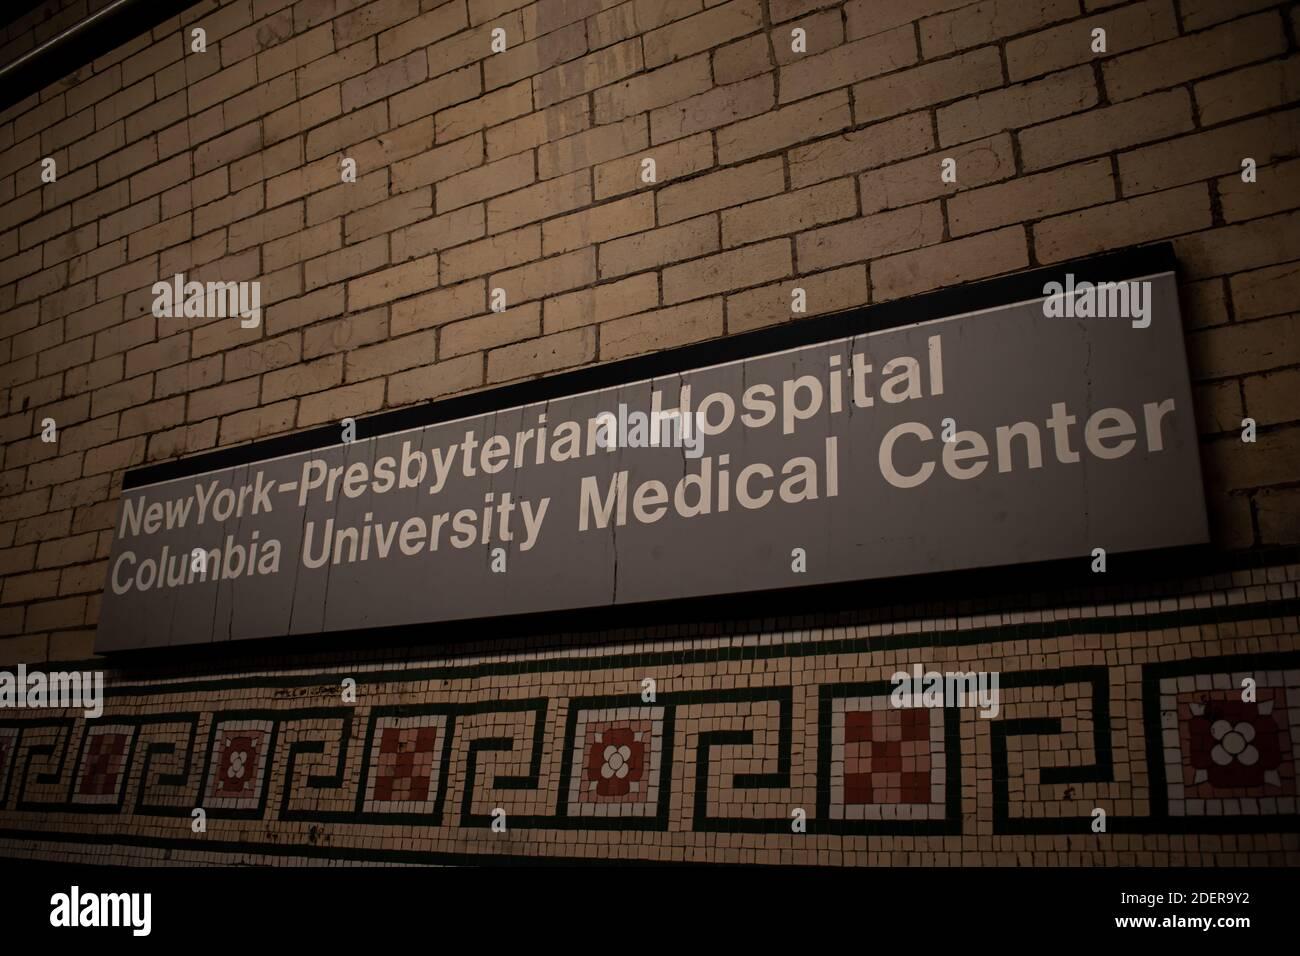 Hôpital presbytérien de New York - Columbia University Medical Center Subway Panneau Washington Heights NY Banque D'Images